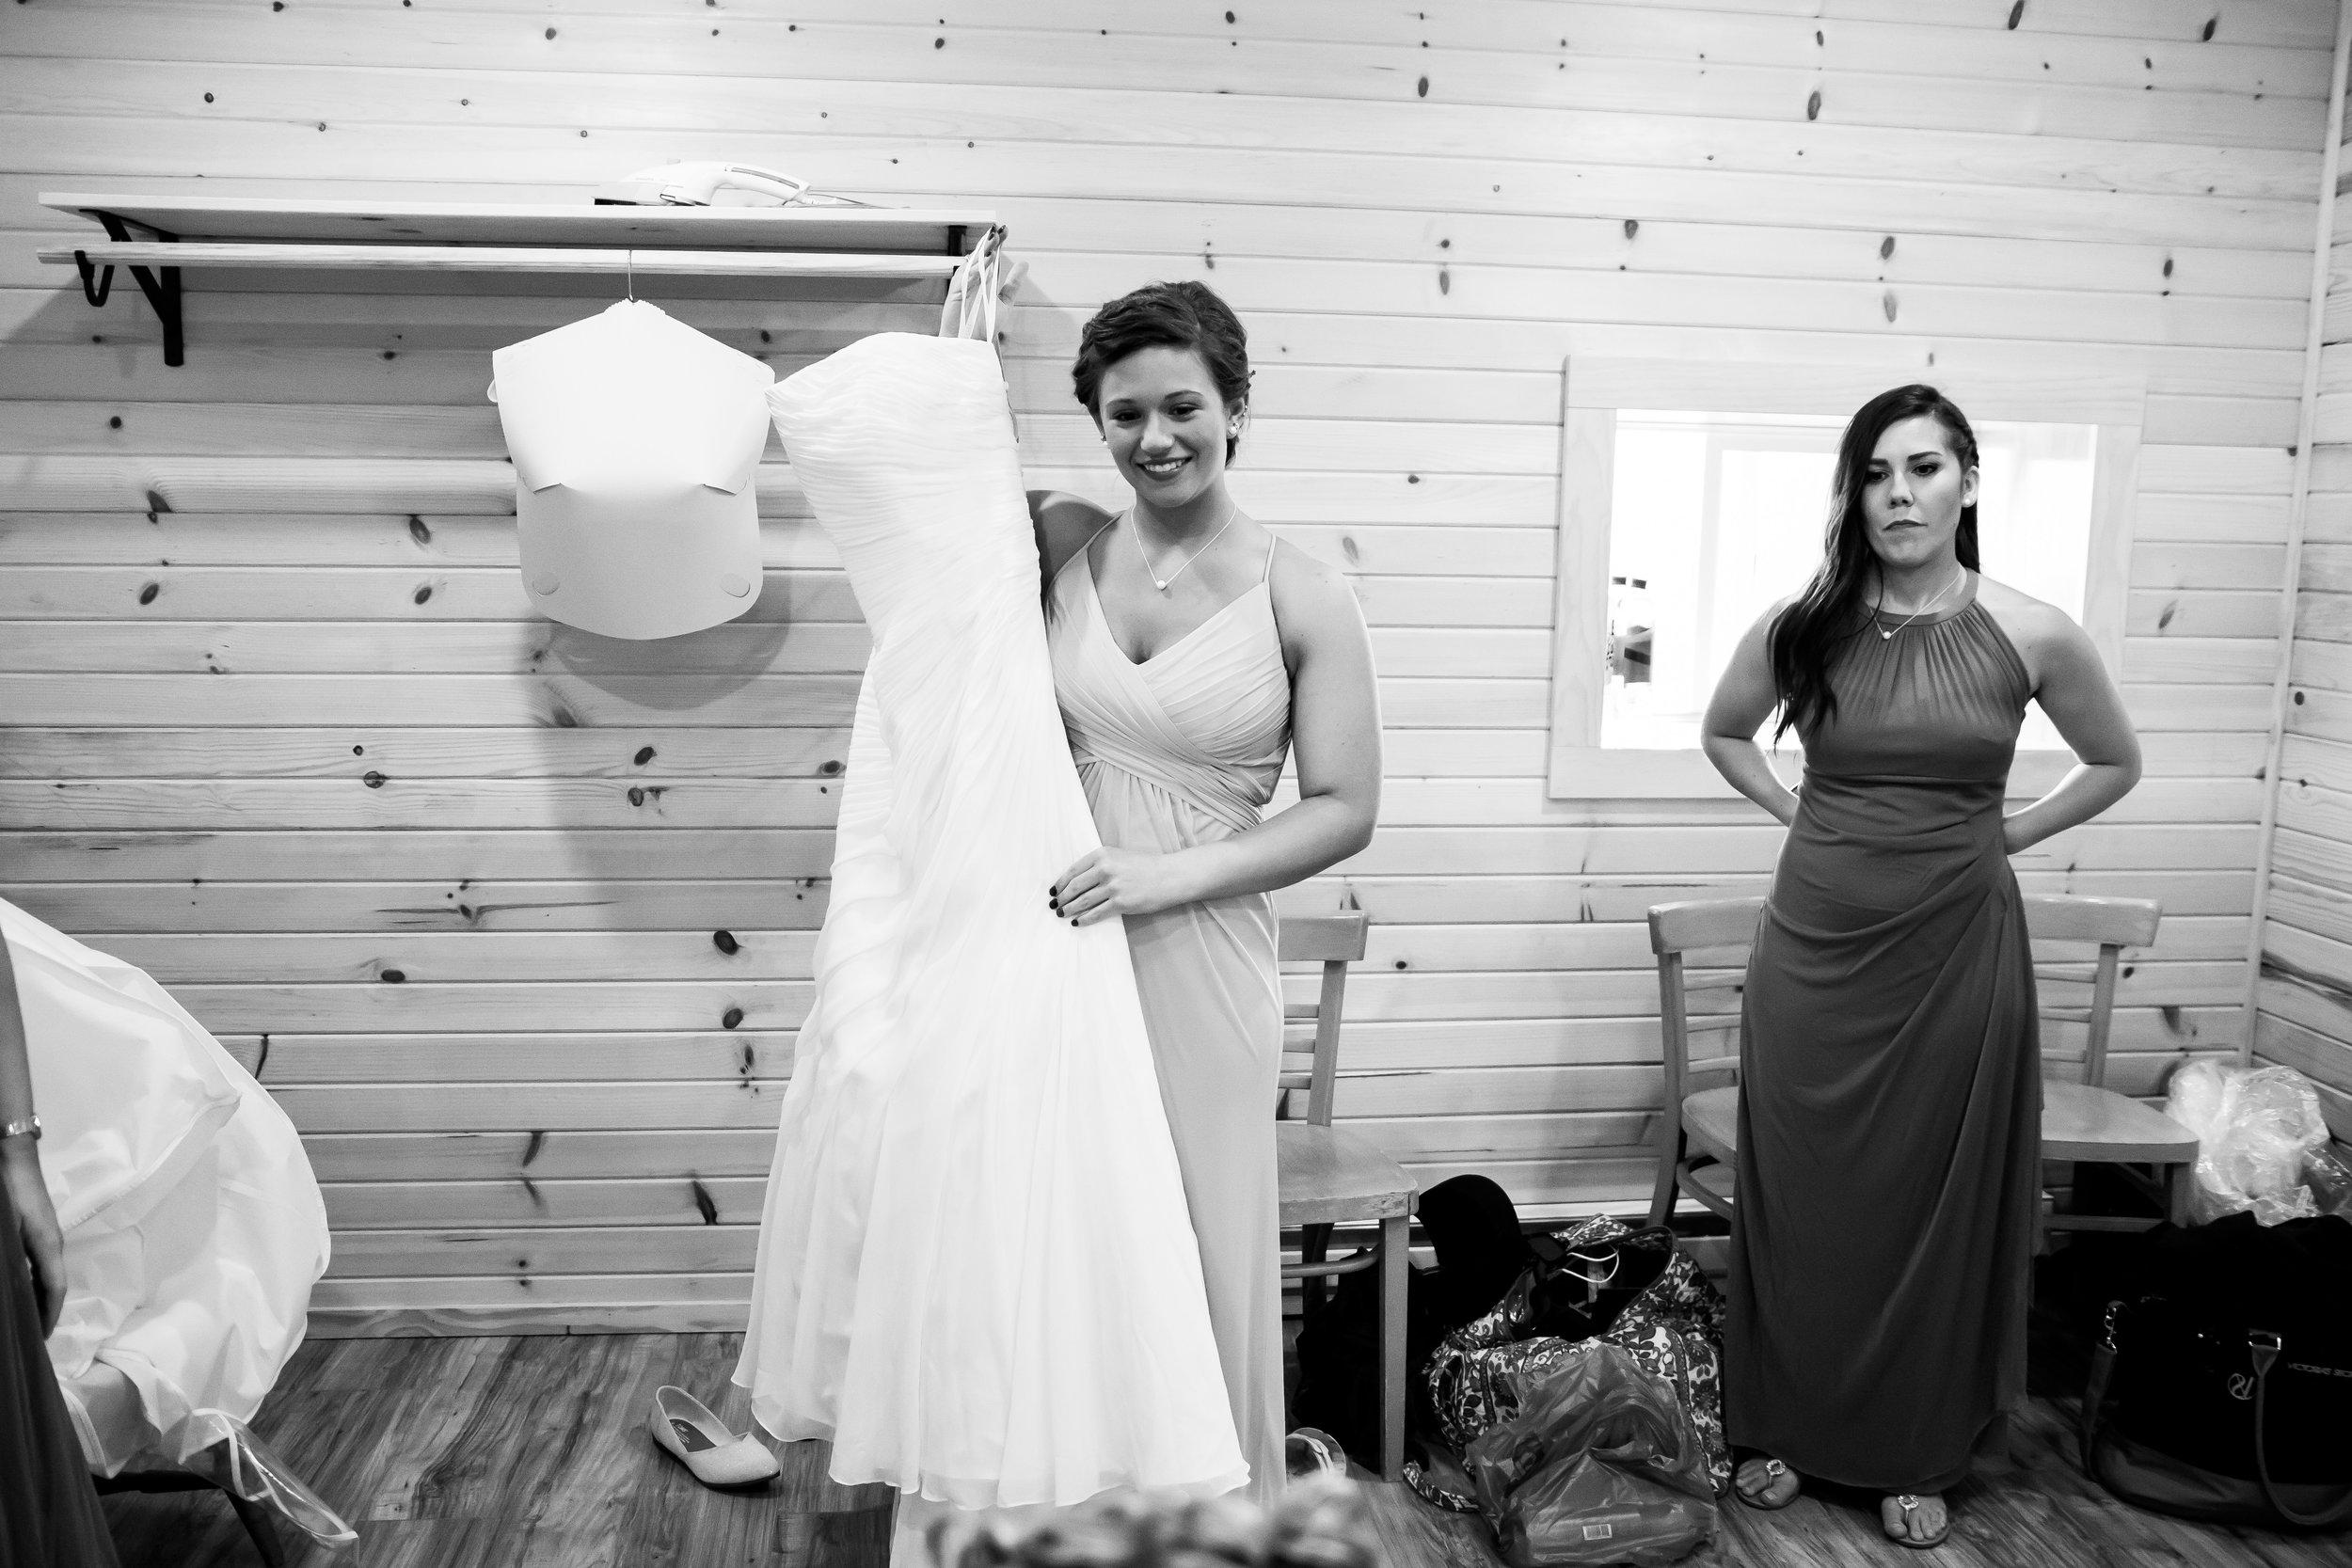 Indiana_Wedding_Photography_Zacharaiah-76.jpg